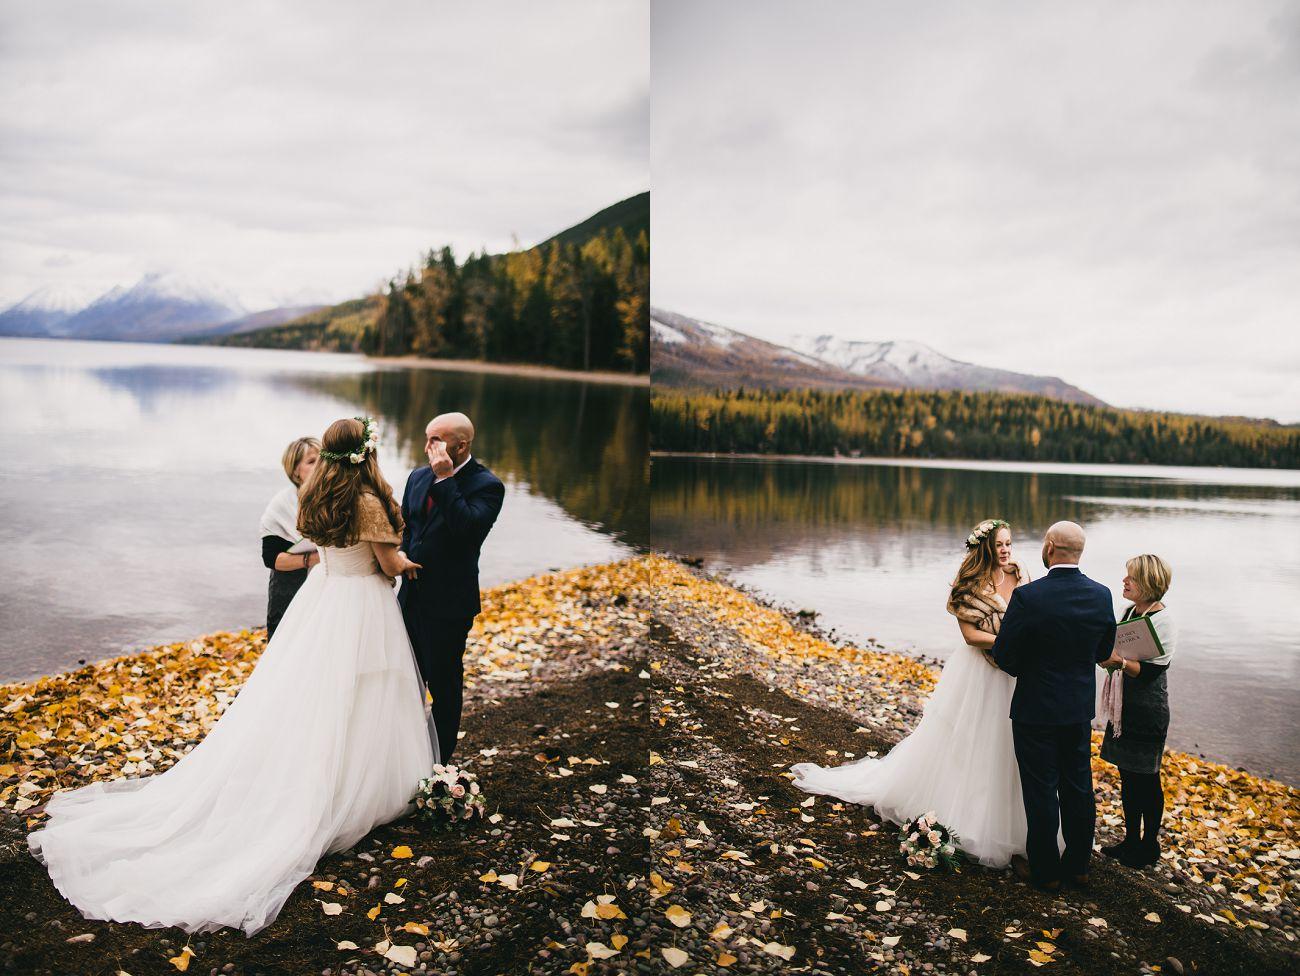 Jennifer_Mooney_Photo_Whitefish_mountain_resort_wedding_elegant_montana_wedding_033.jpg